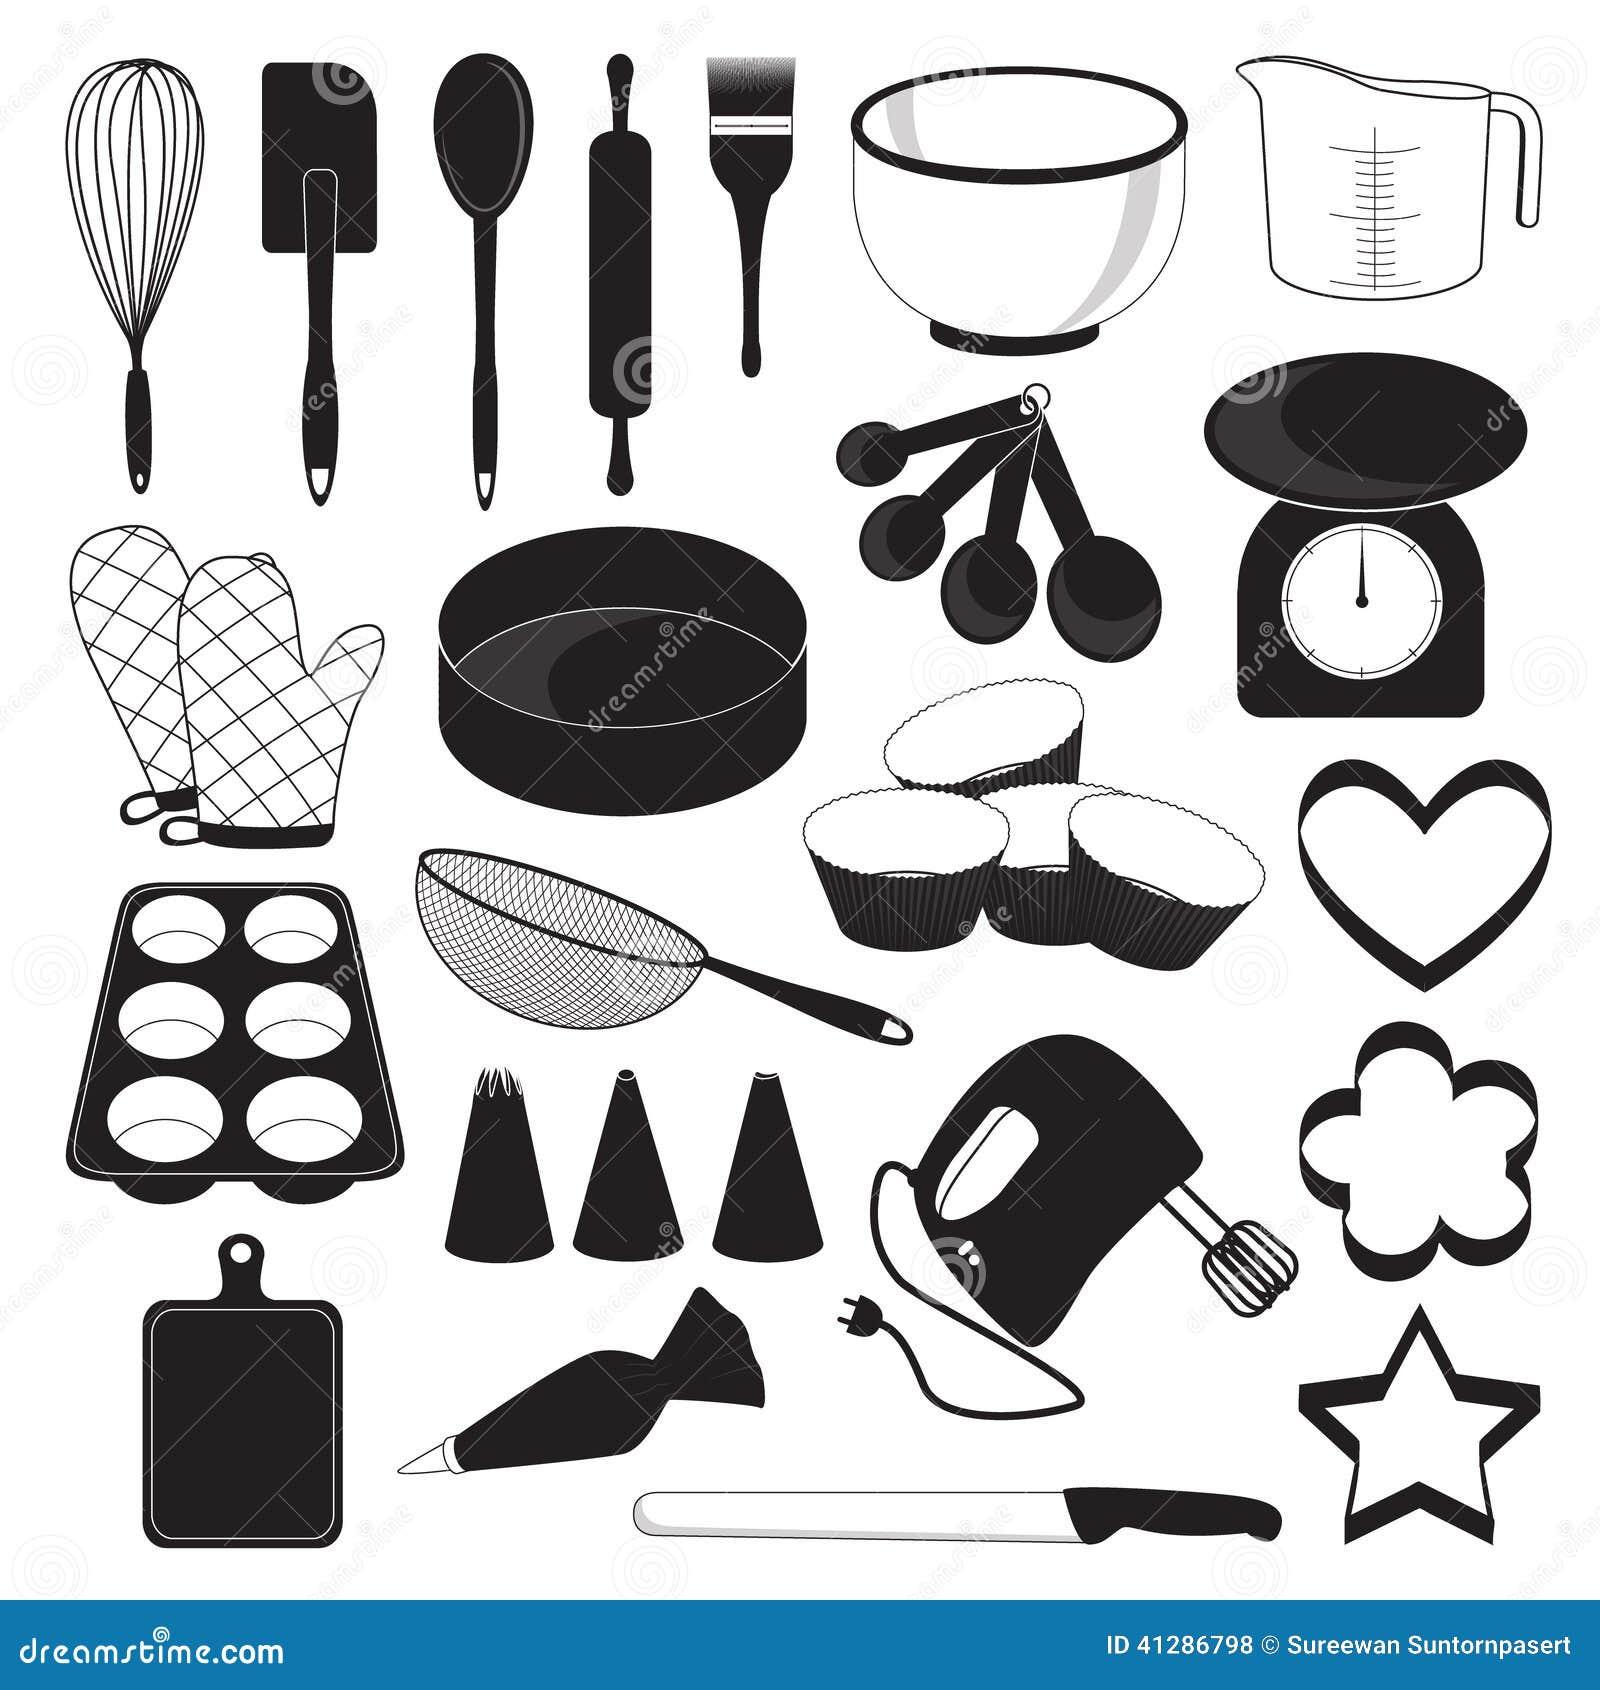 Bread Clip Art Illustrations  Clipart Guide